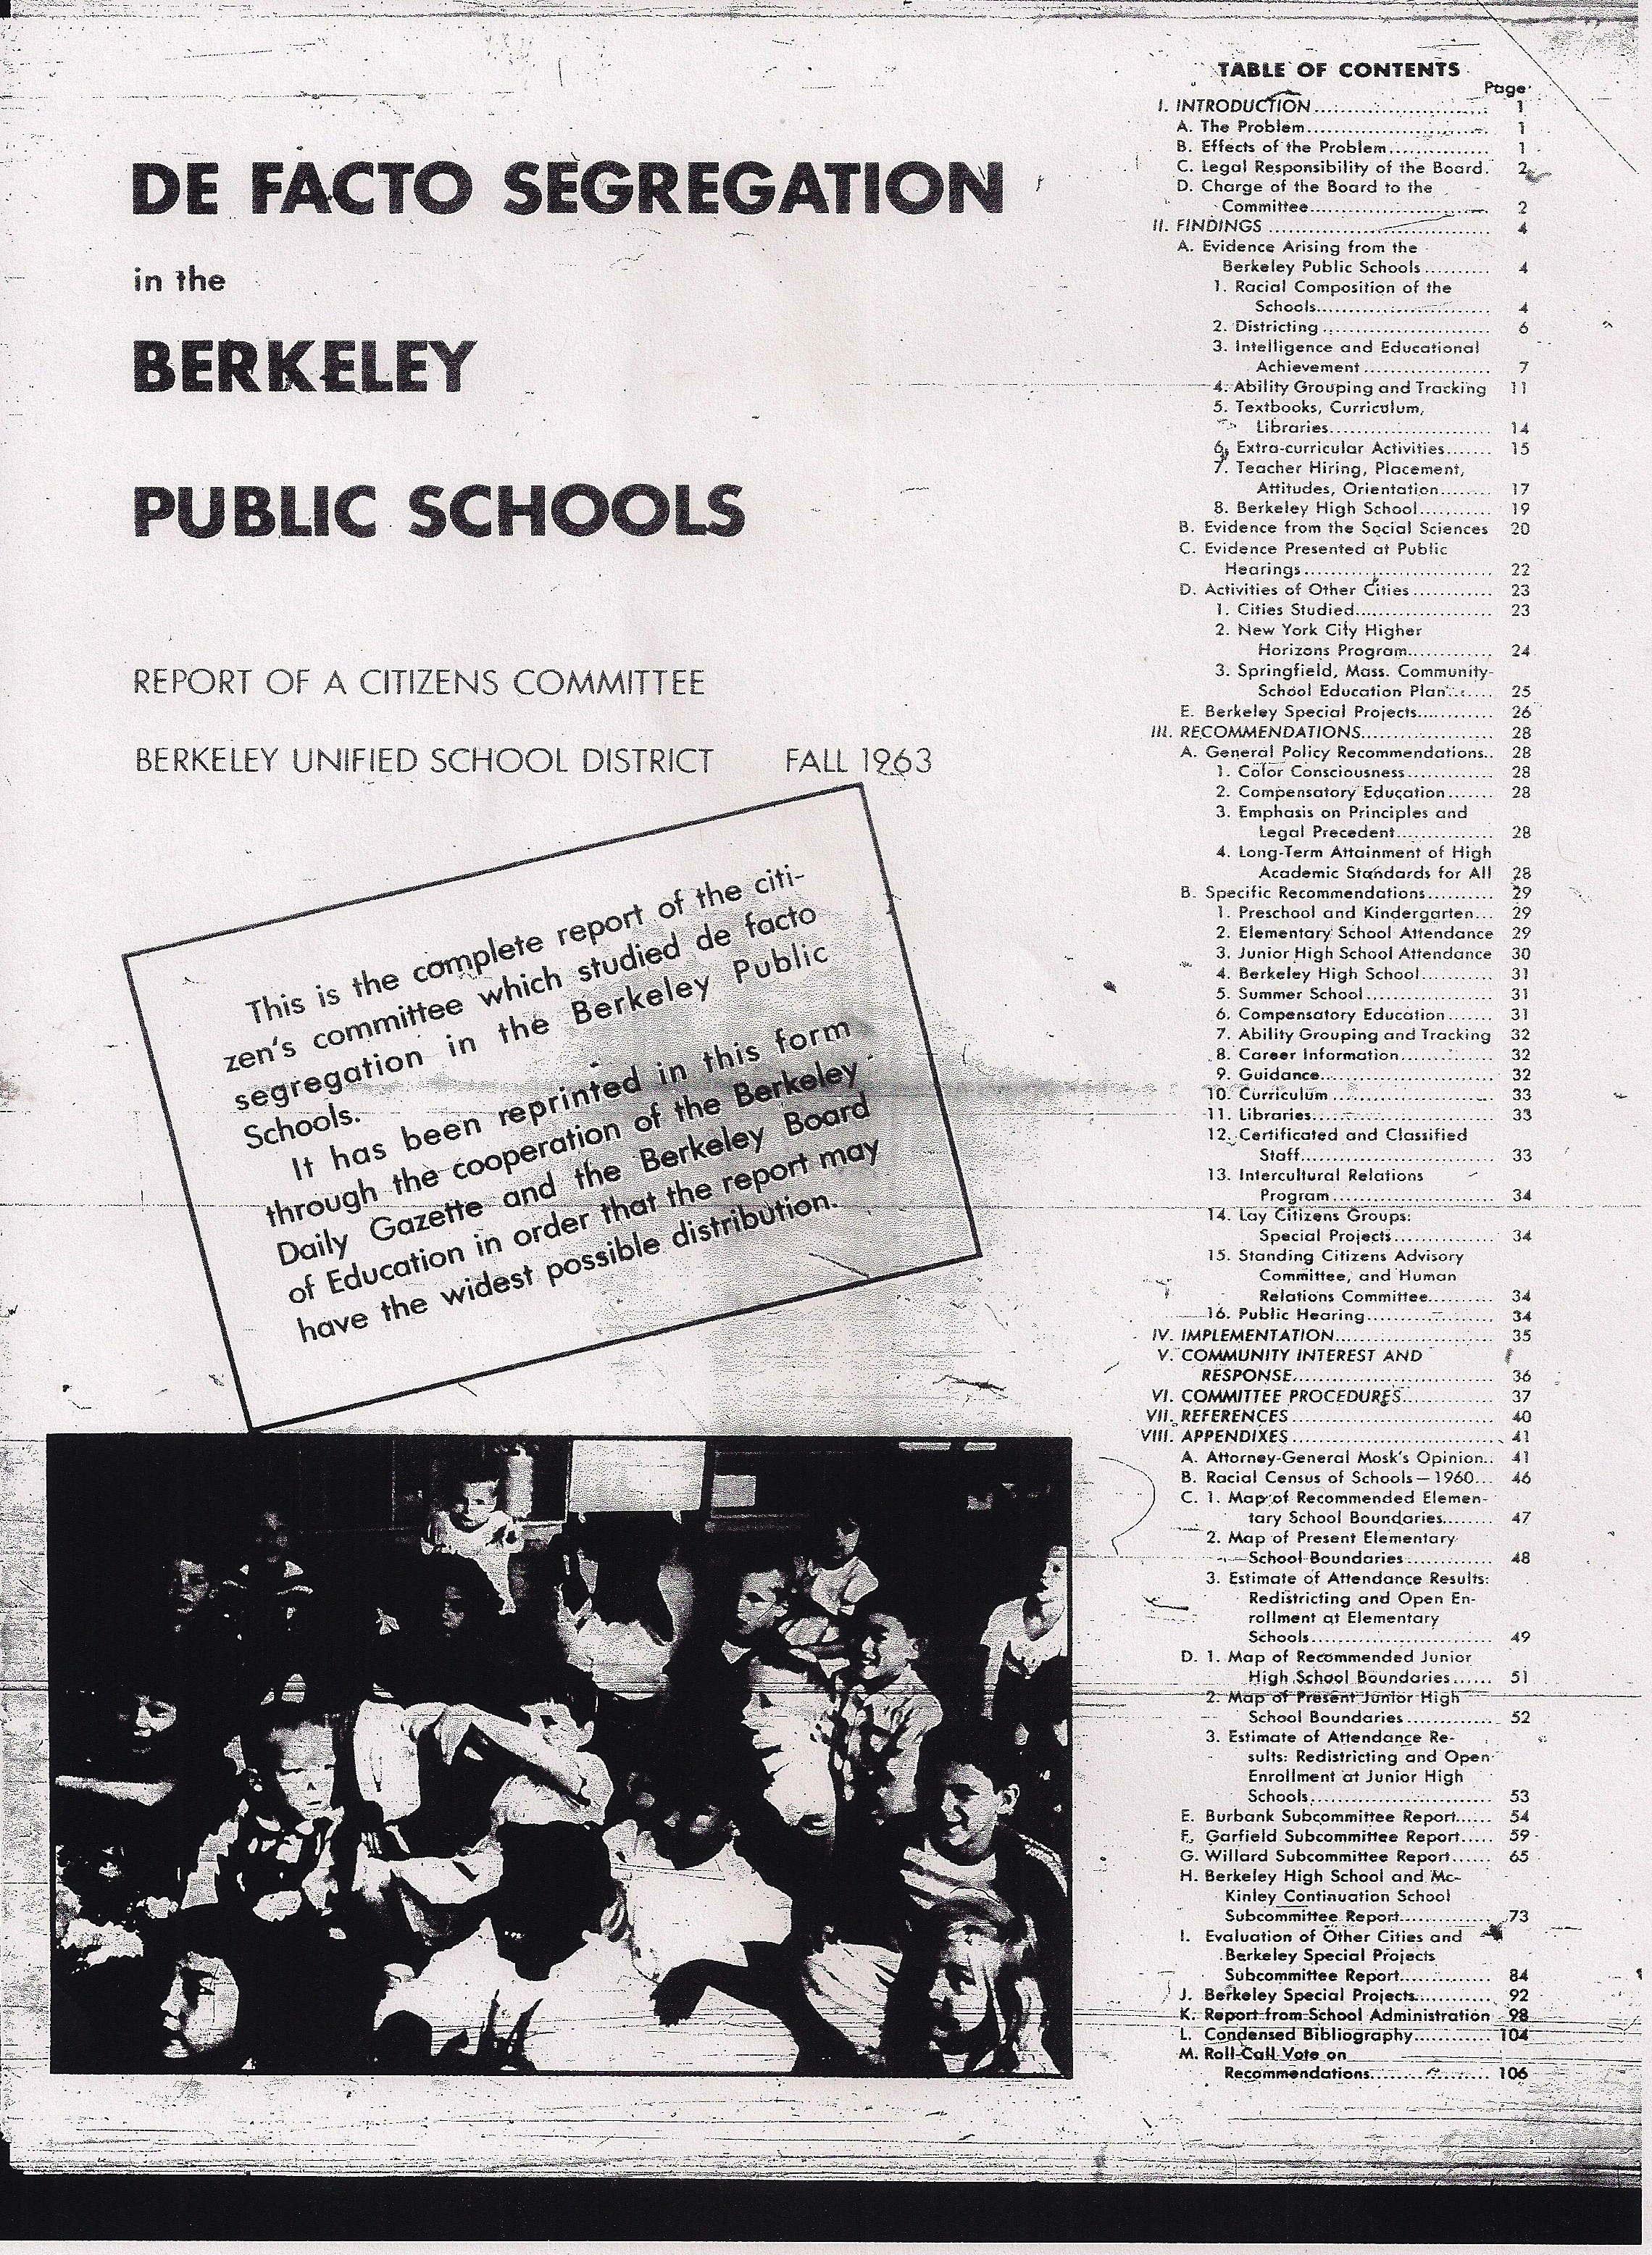 """De Facto Segregation Study Committee"" for the Berkeley Unified School District (November 1963)"